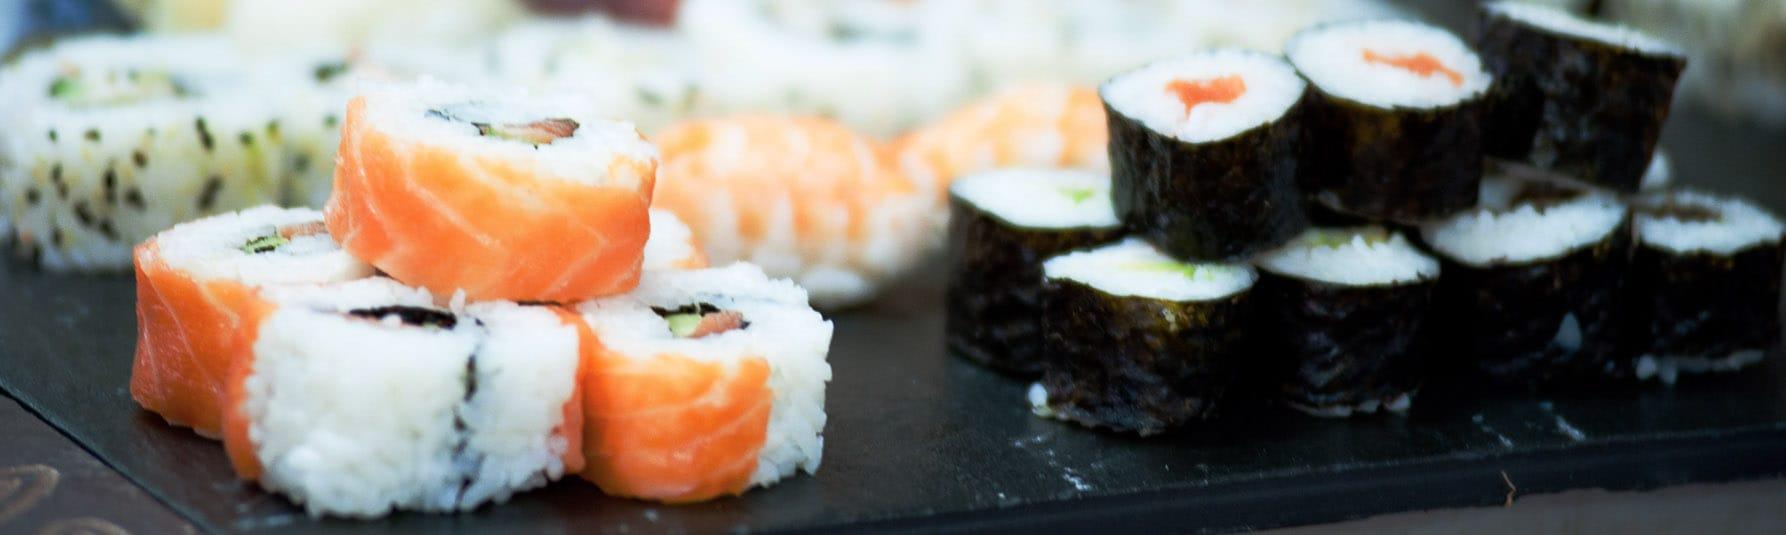 slide-sushi3